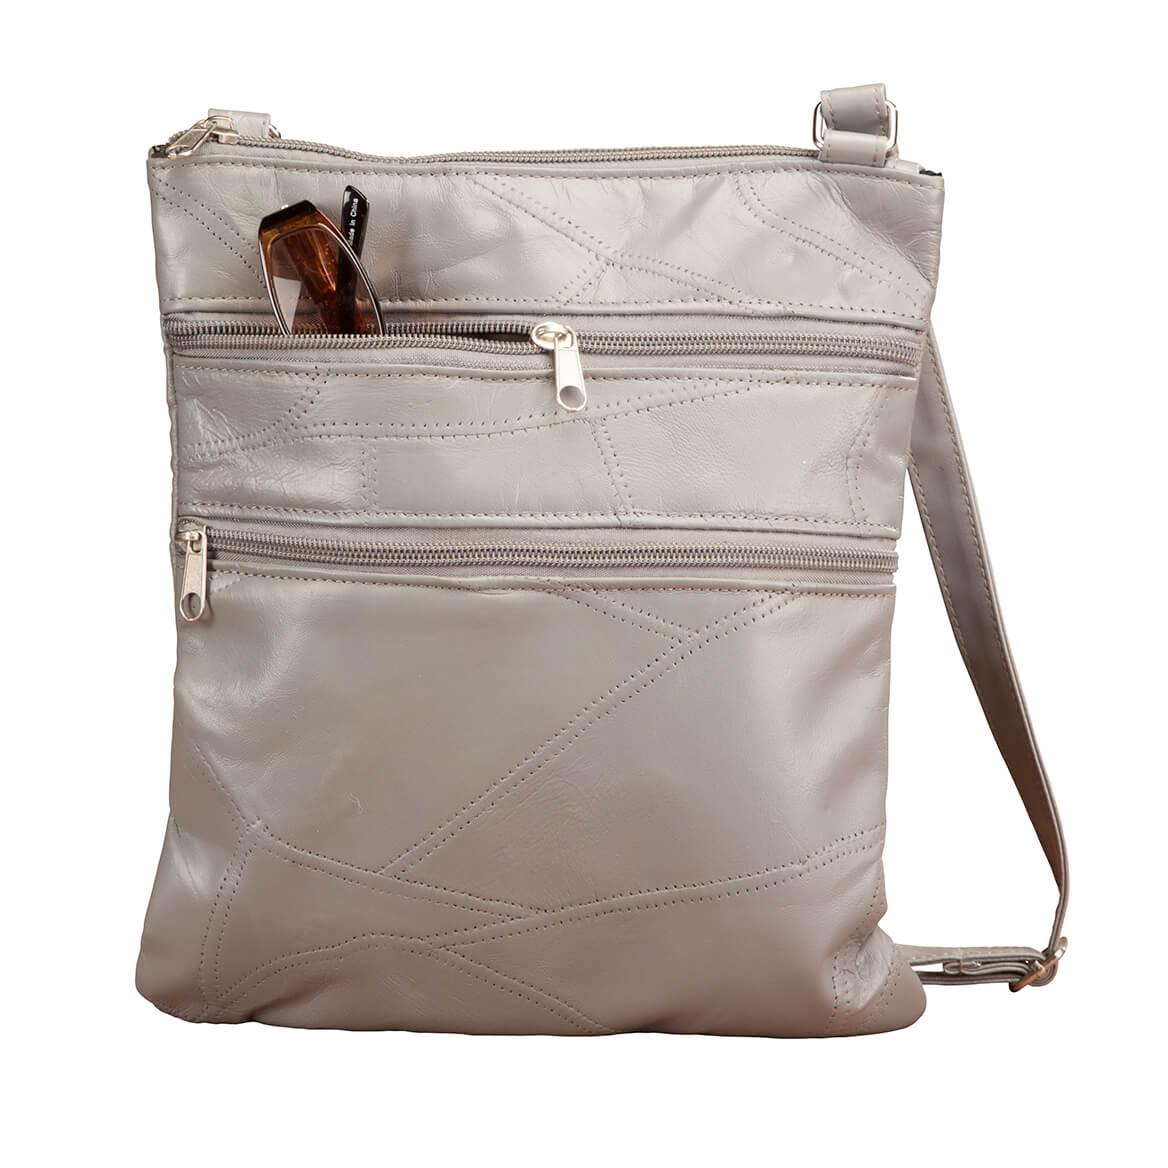 RFID Lambskin Patch Leather Crossbody Bag-363493